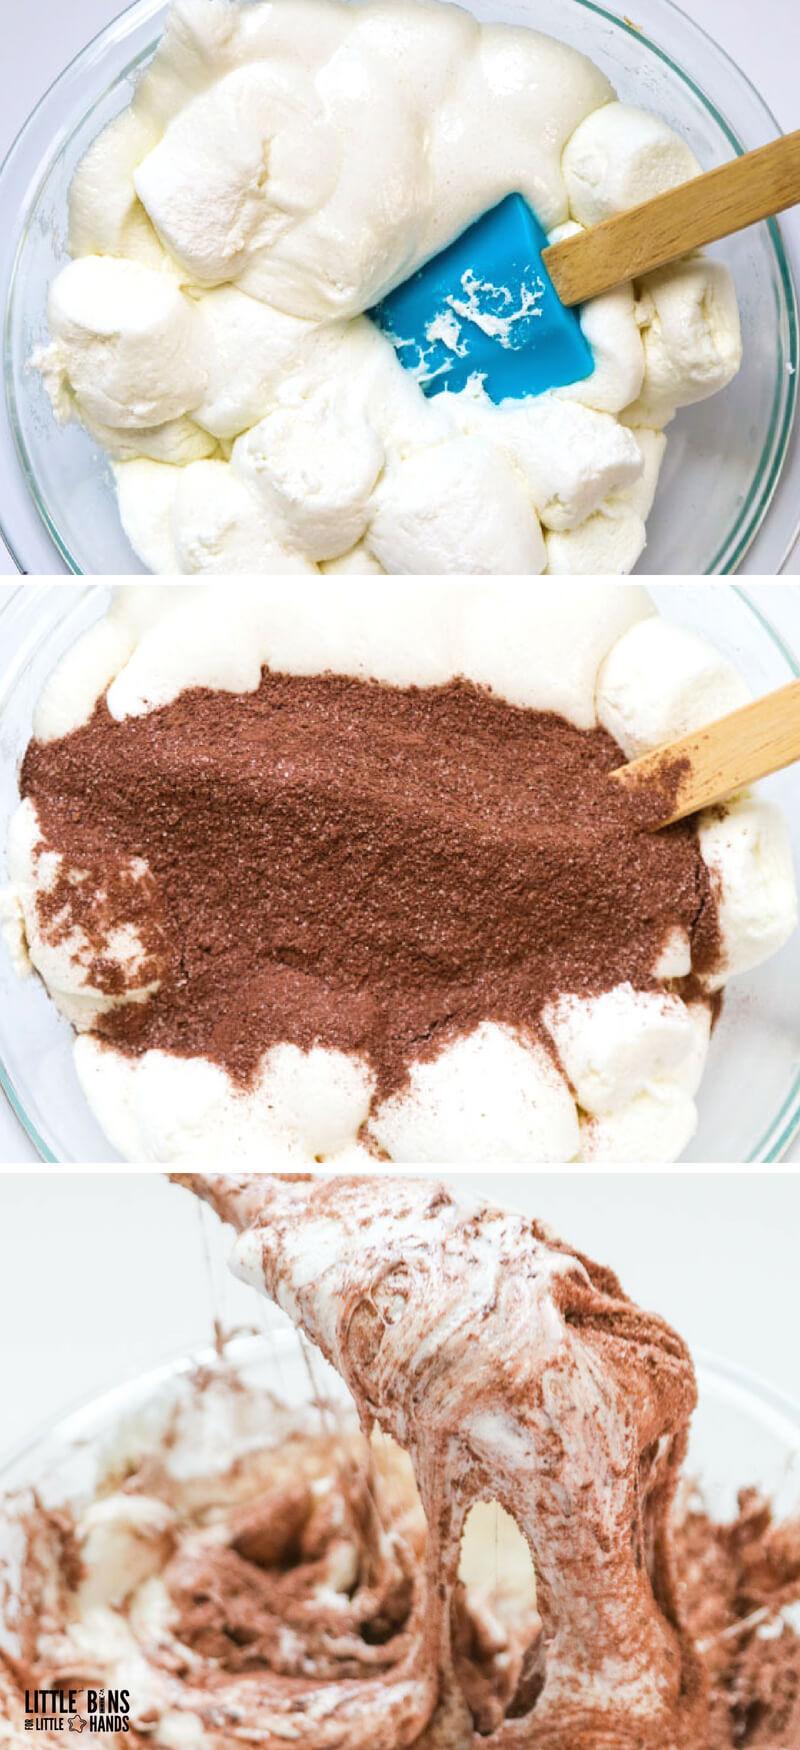 edible chocolate slime tutorial with 3 ingredient edible chocolate slime recipe